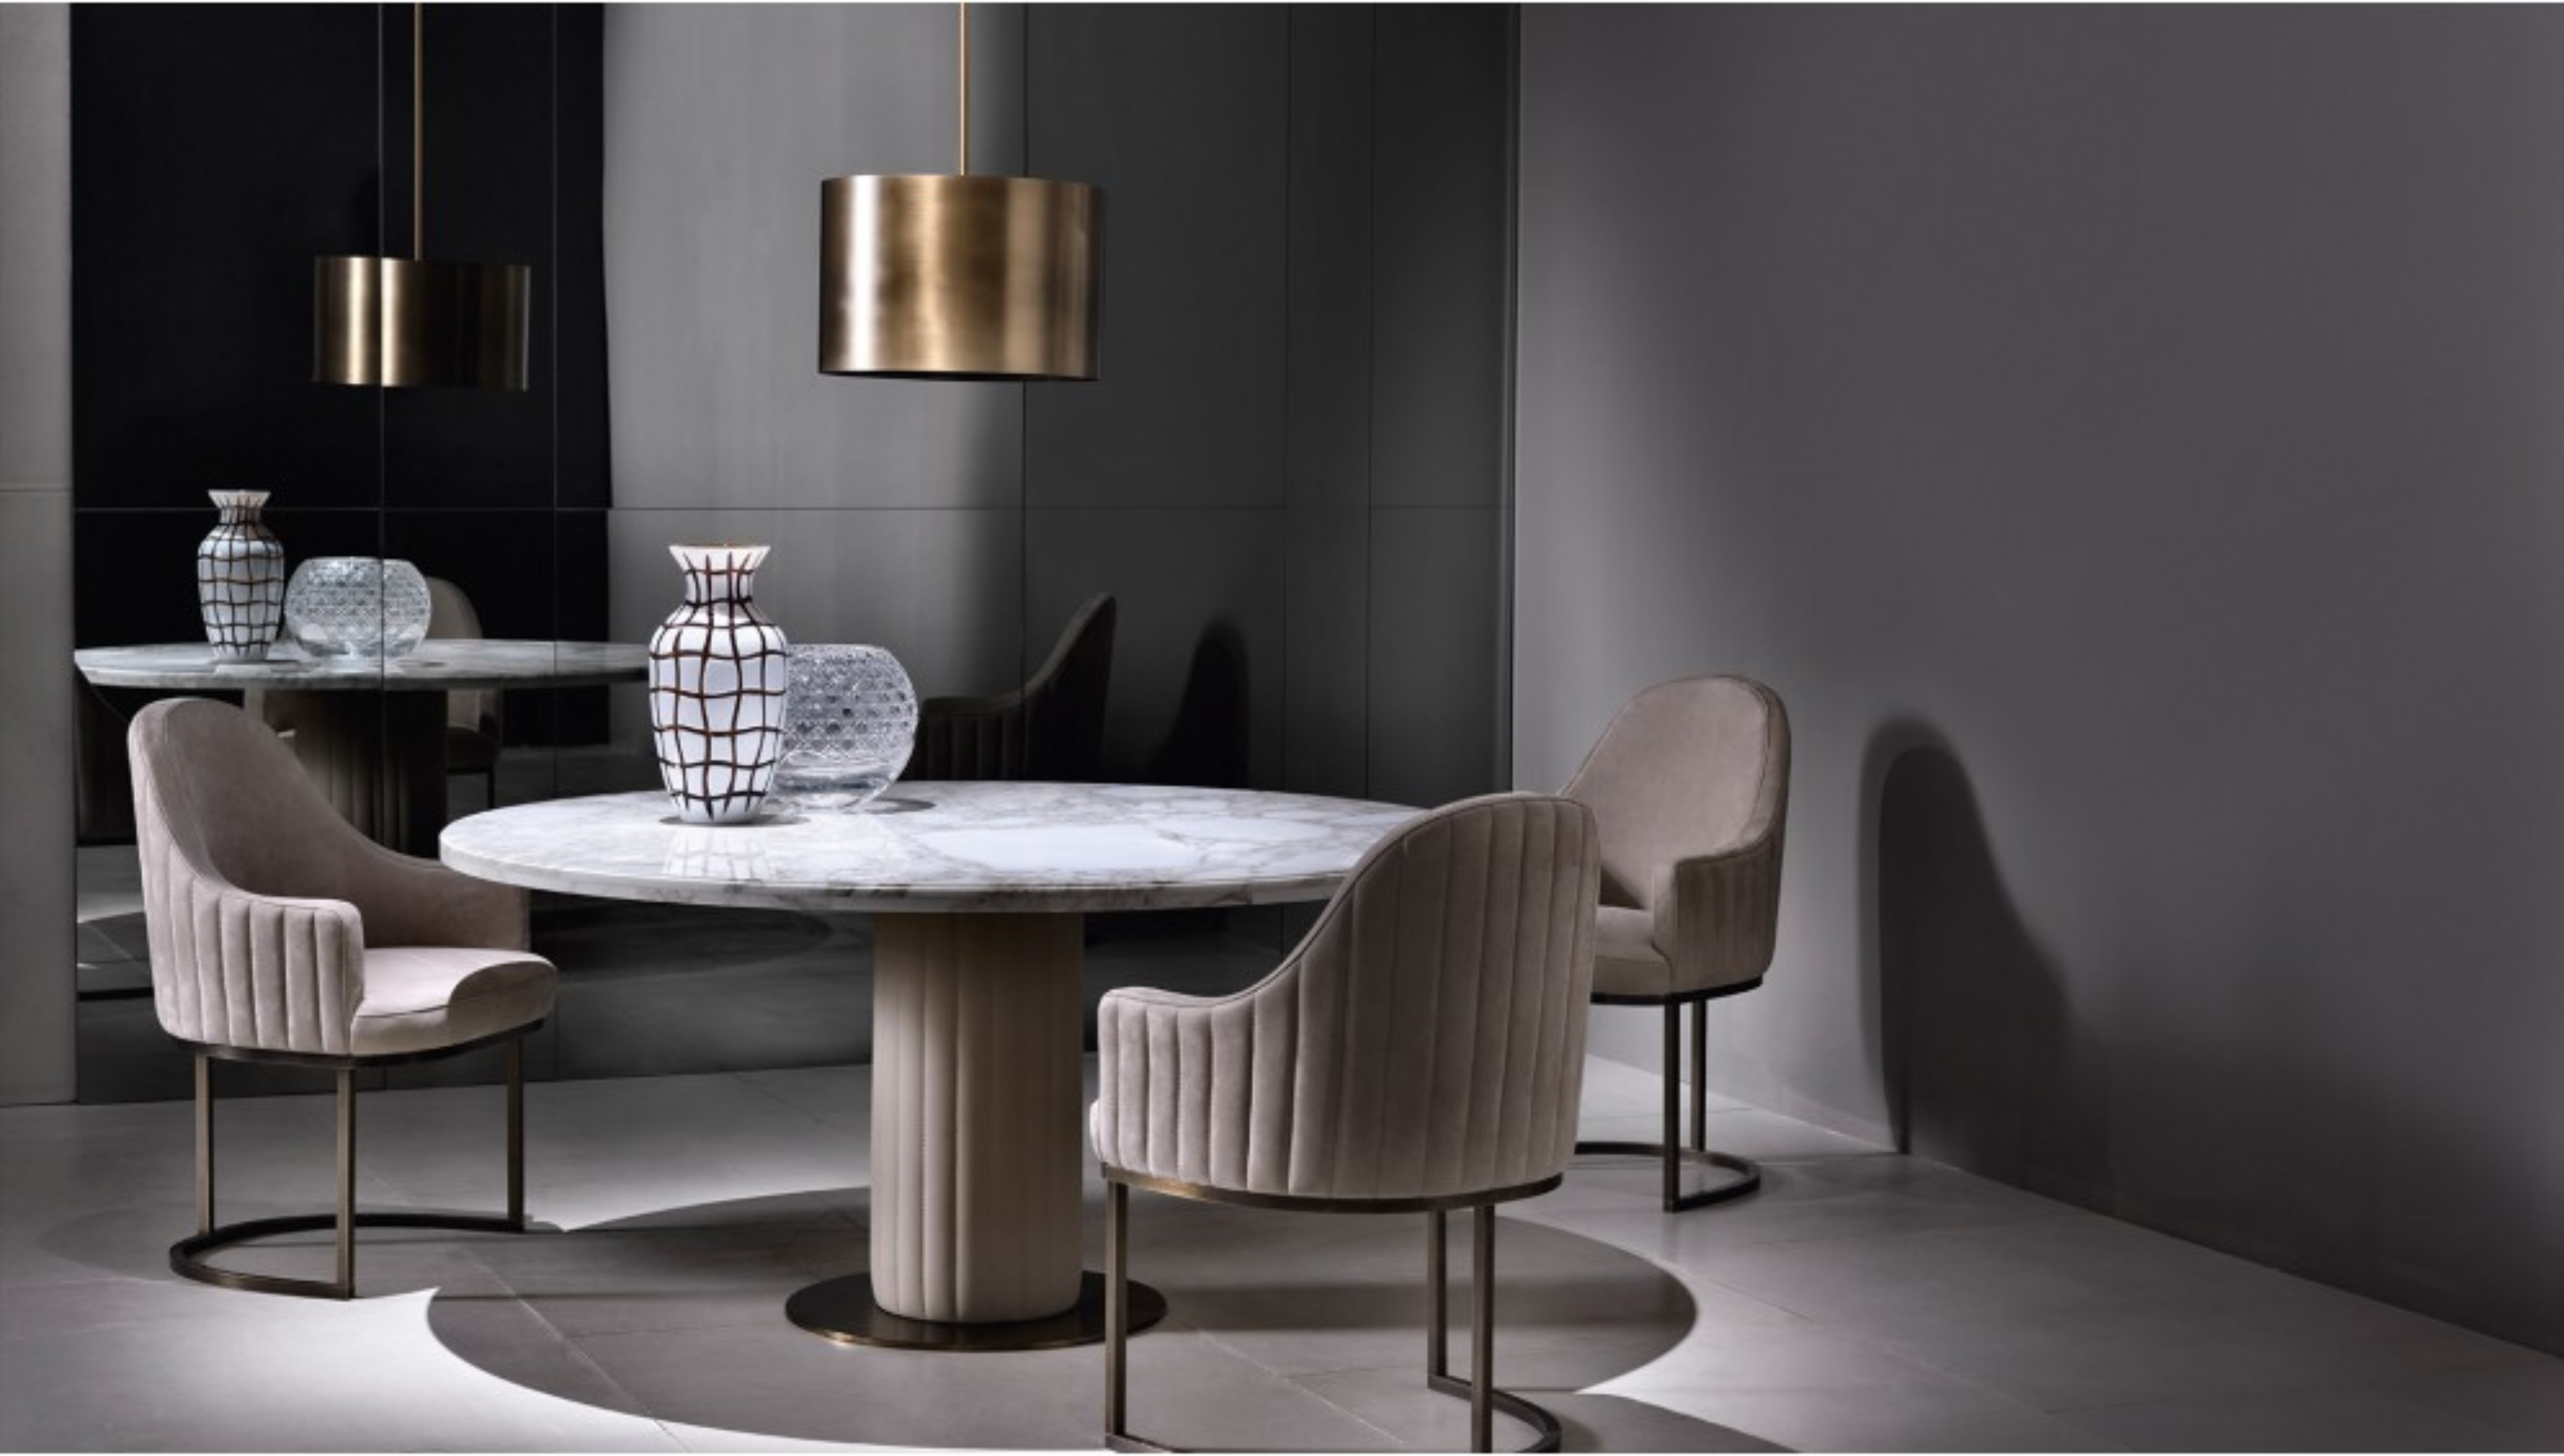 dining room decor ideas 5 Astonishing Dining Room Decor Ideas isabel armchair 2